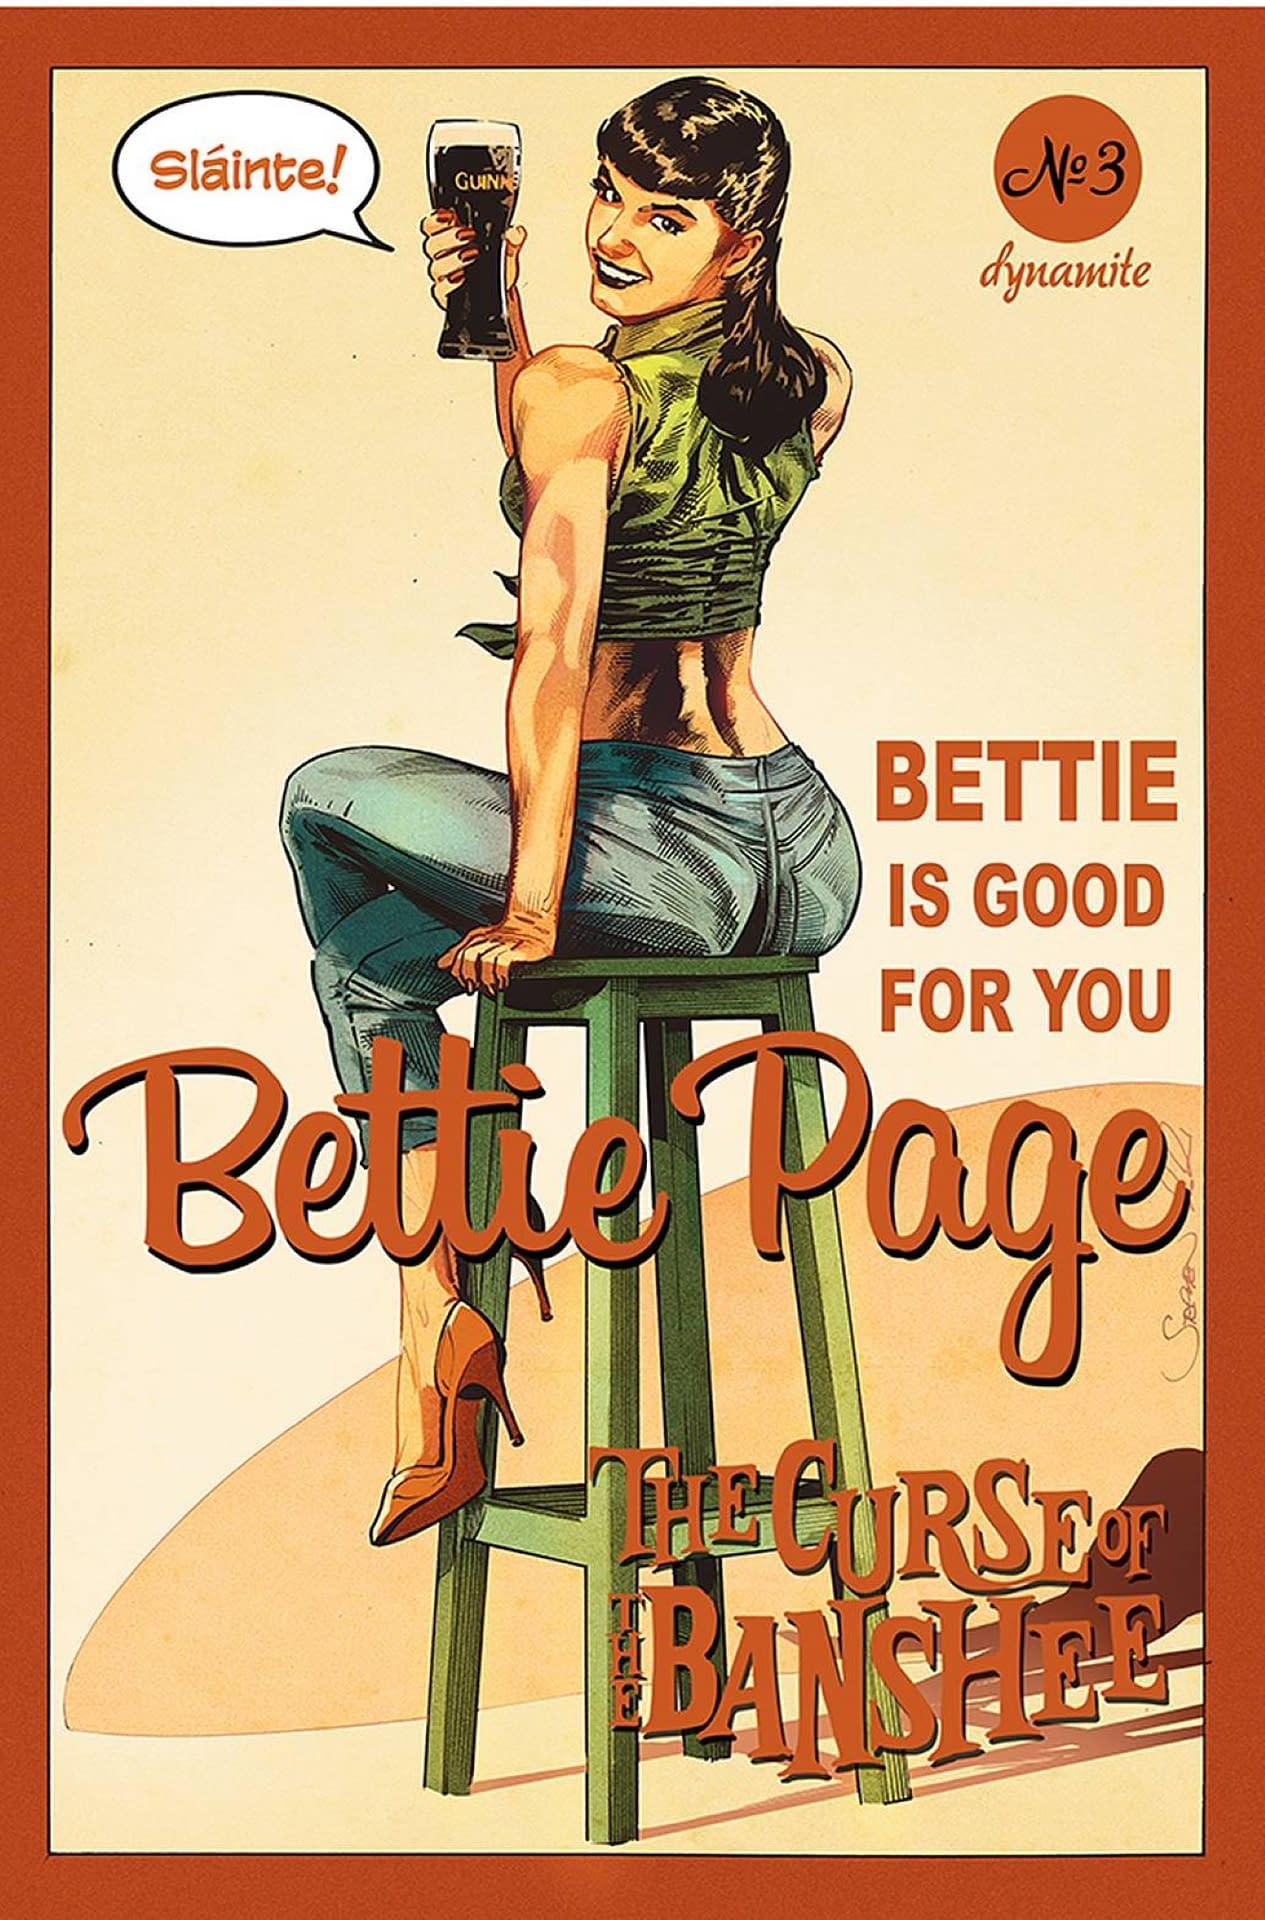 BETTIE PAGE & CURSE OF THE BANSHEE #3 CVR C MOONEY